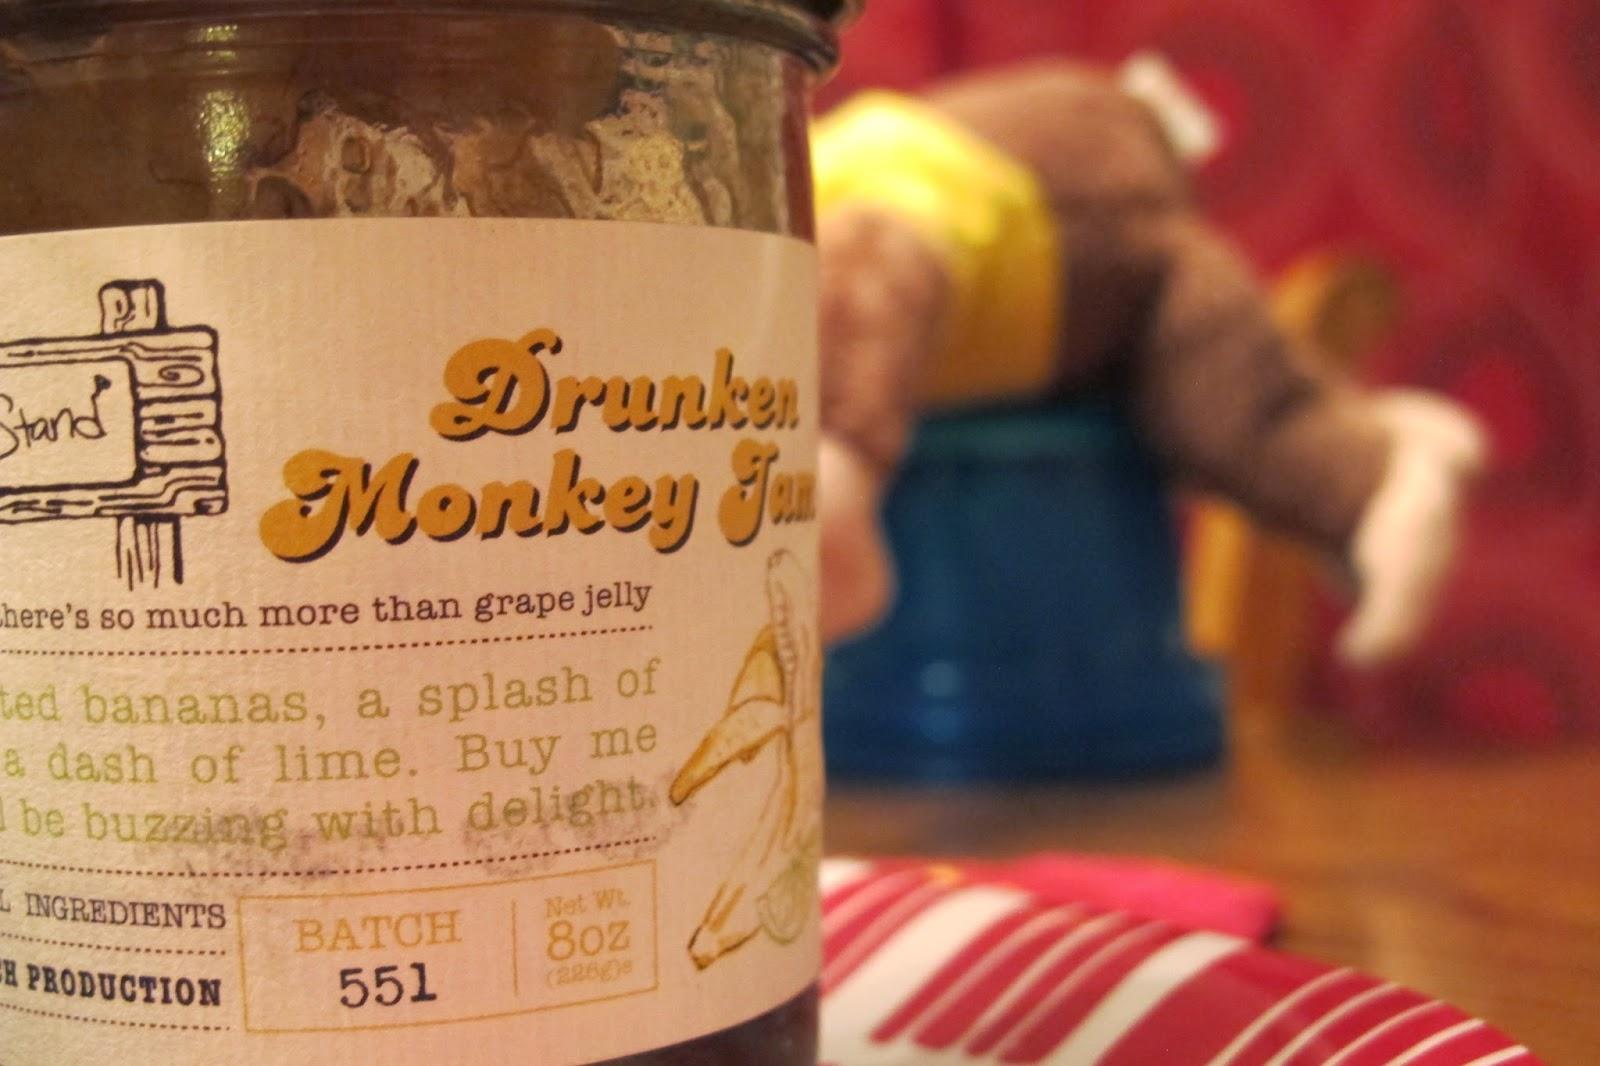 Drunken Monkey Banana Bread with Drunken Monkey Glaze.